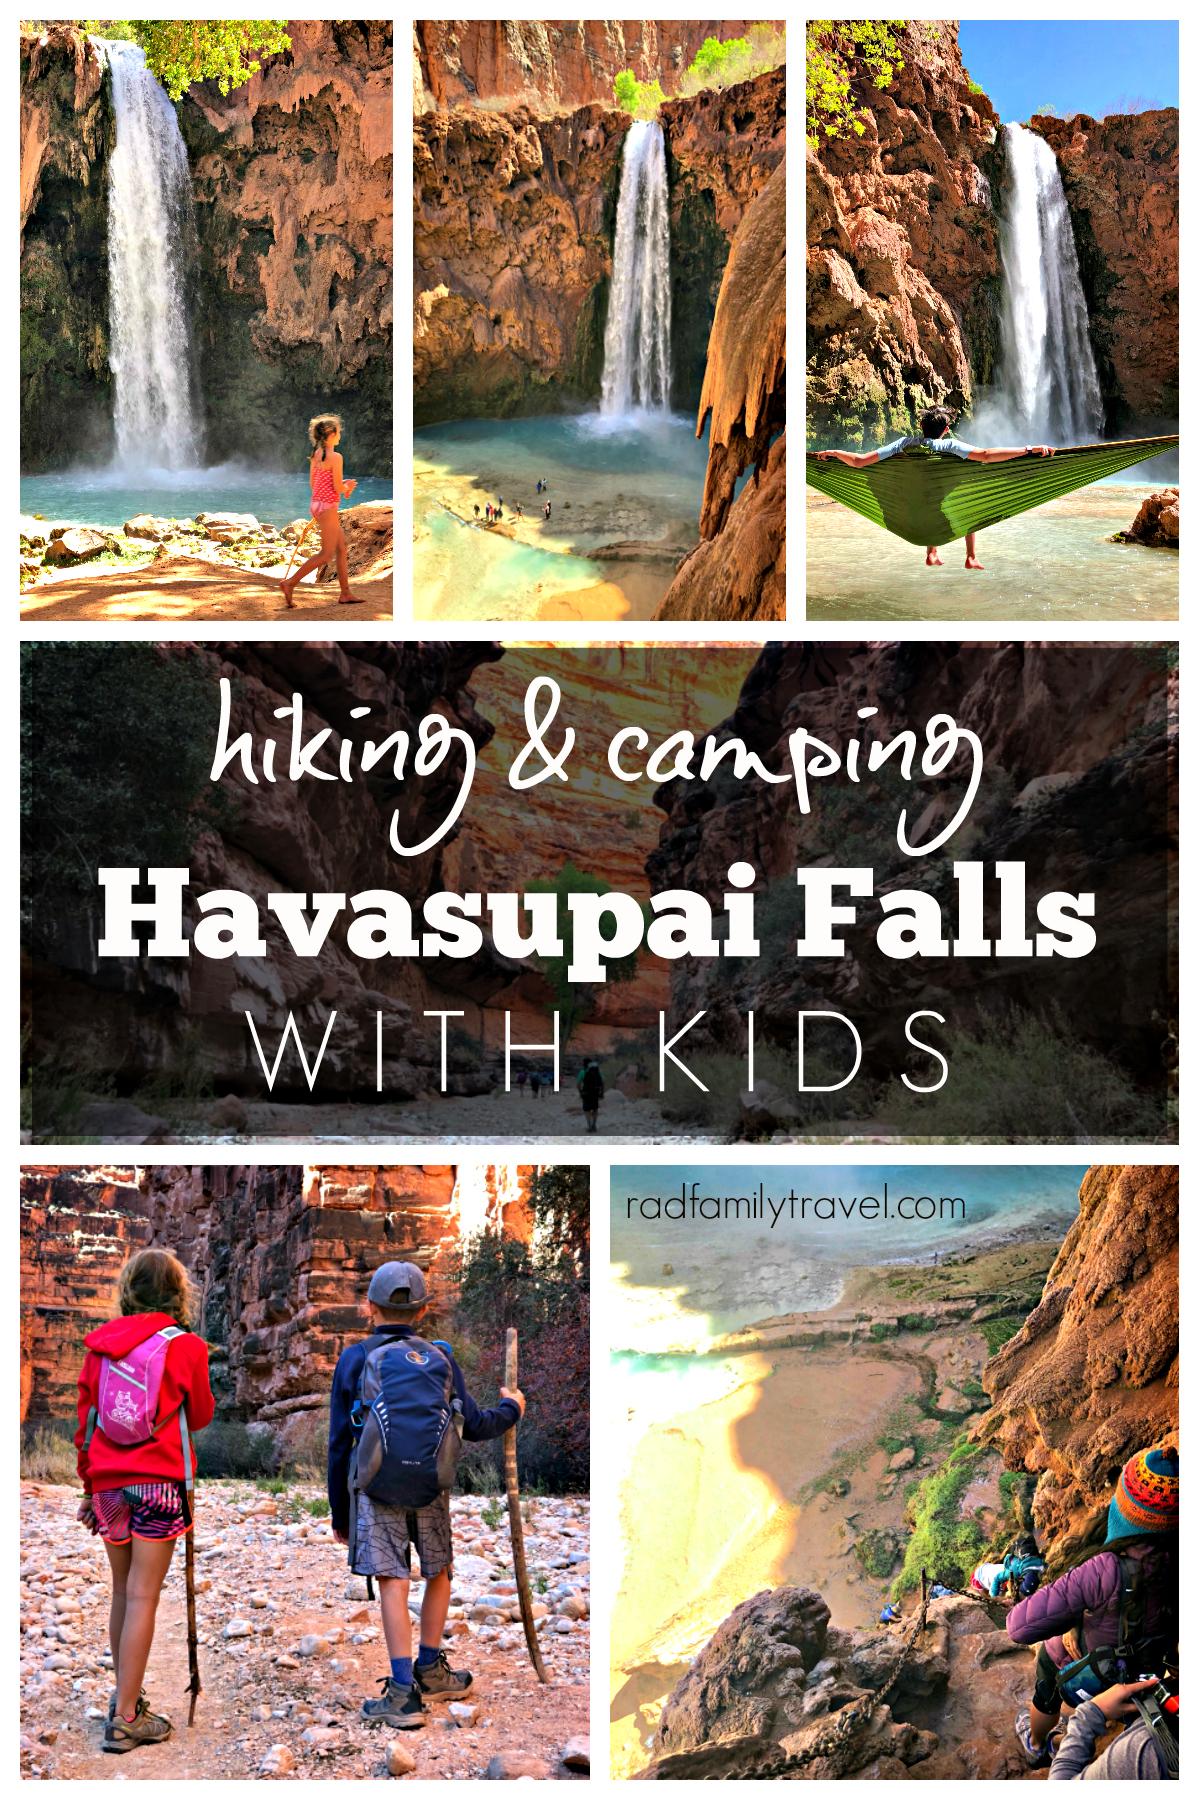 havasupai falls with kids